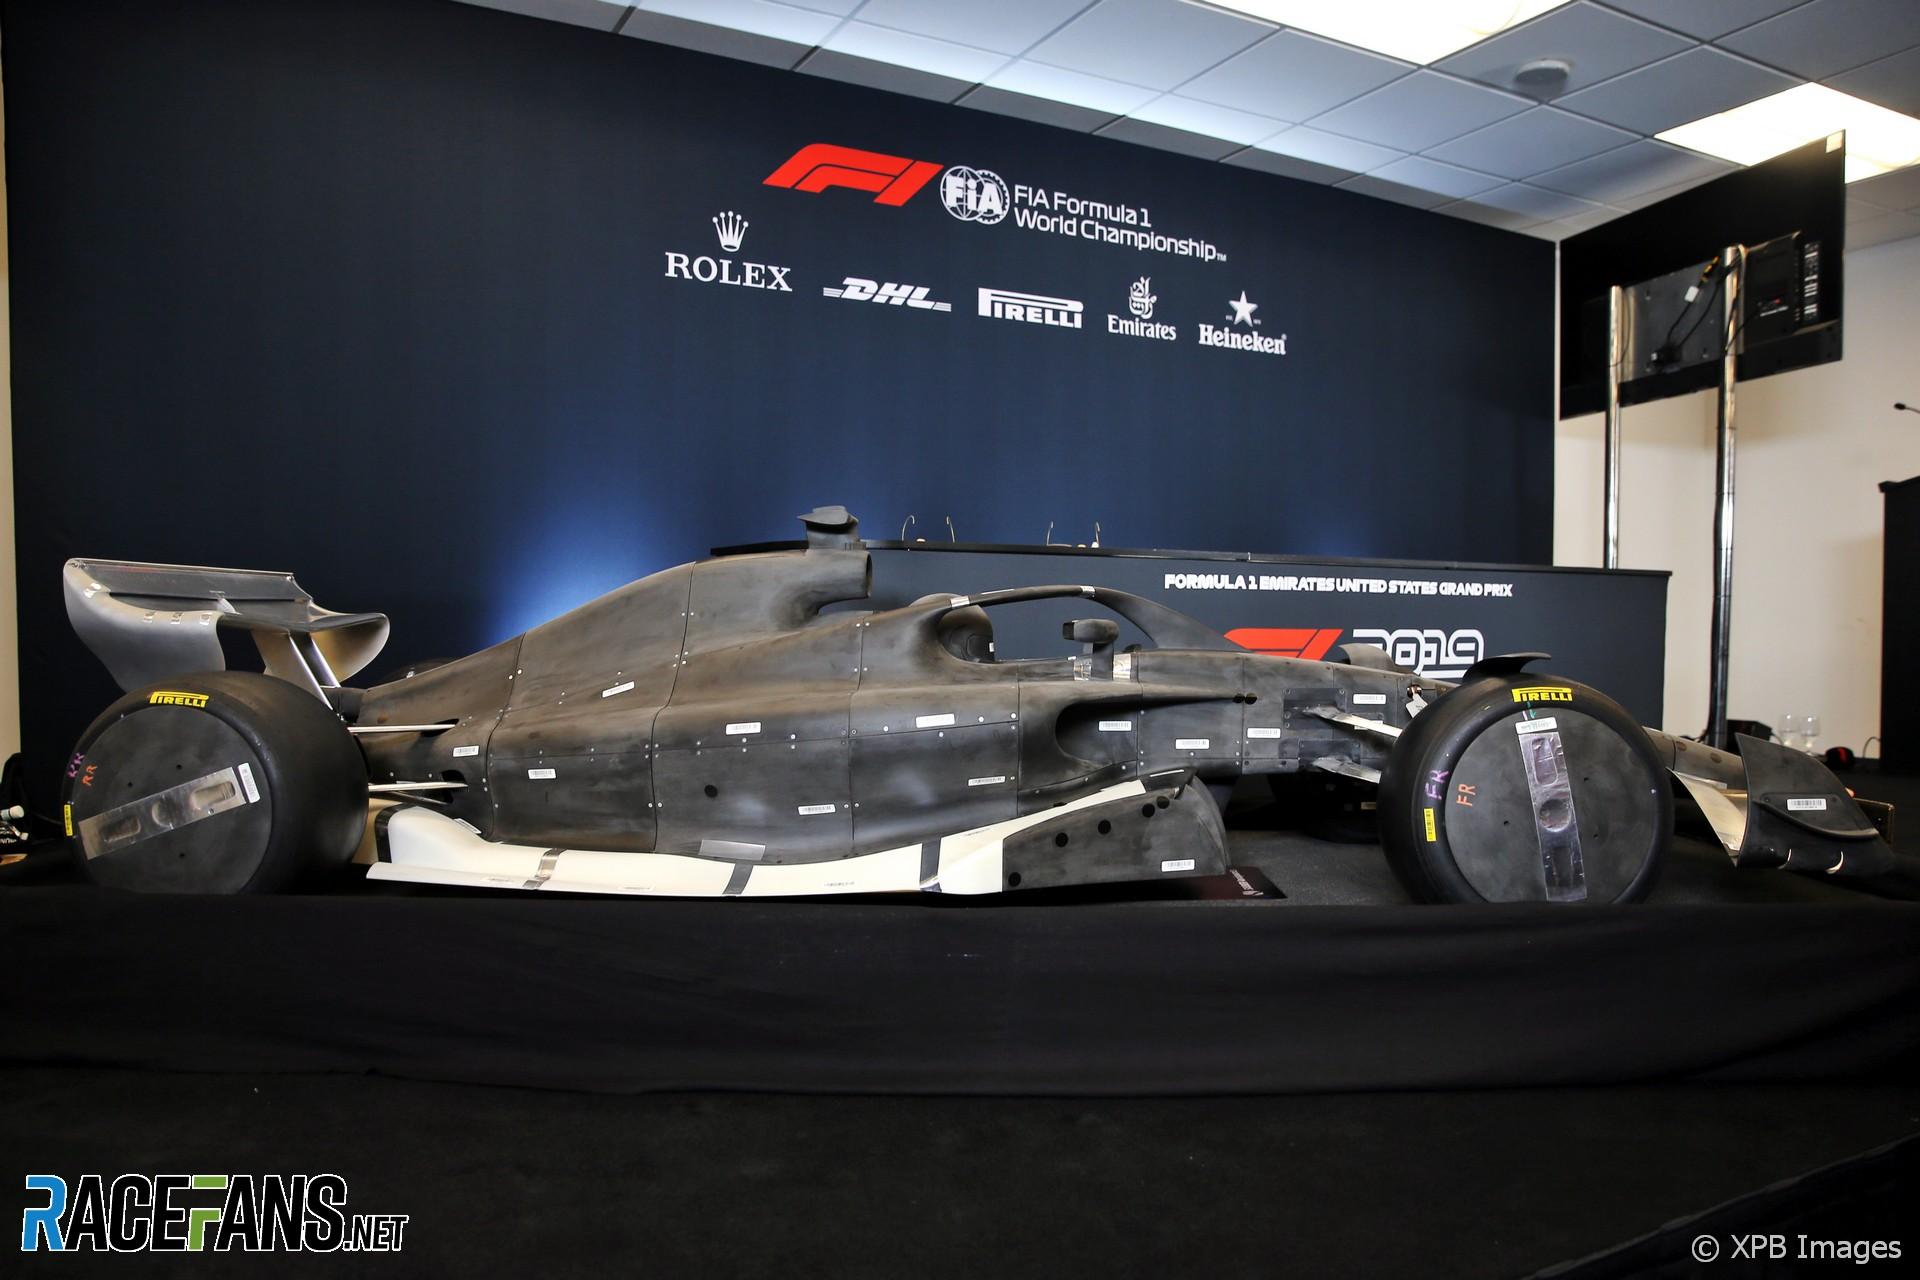 2021 F1 car wind tunnel model